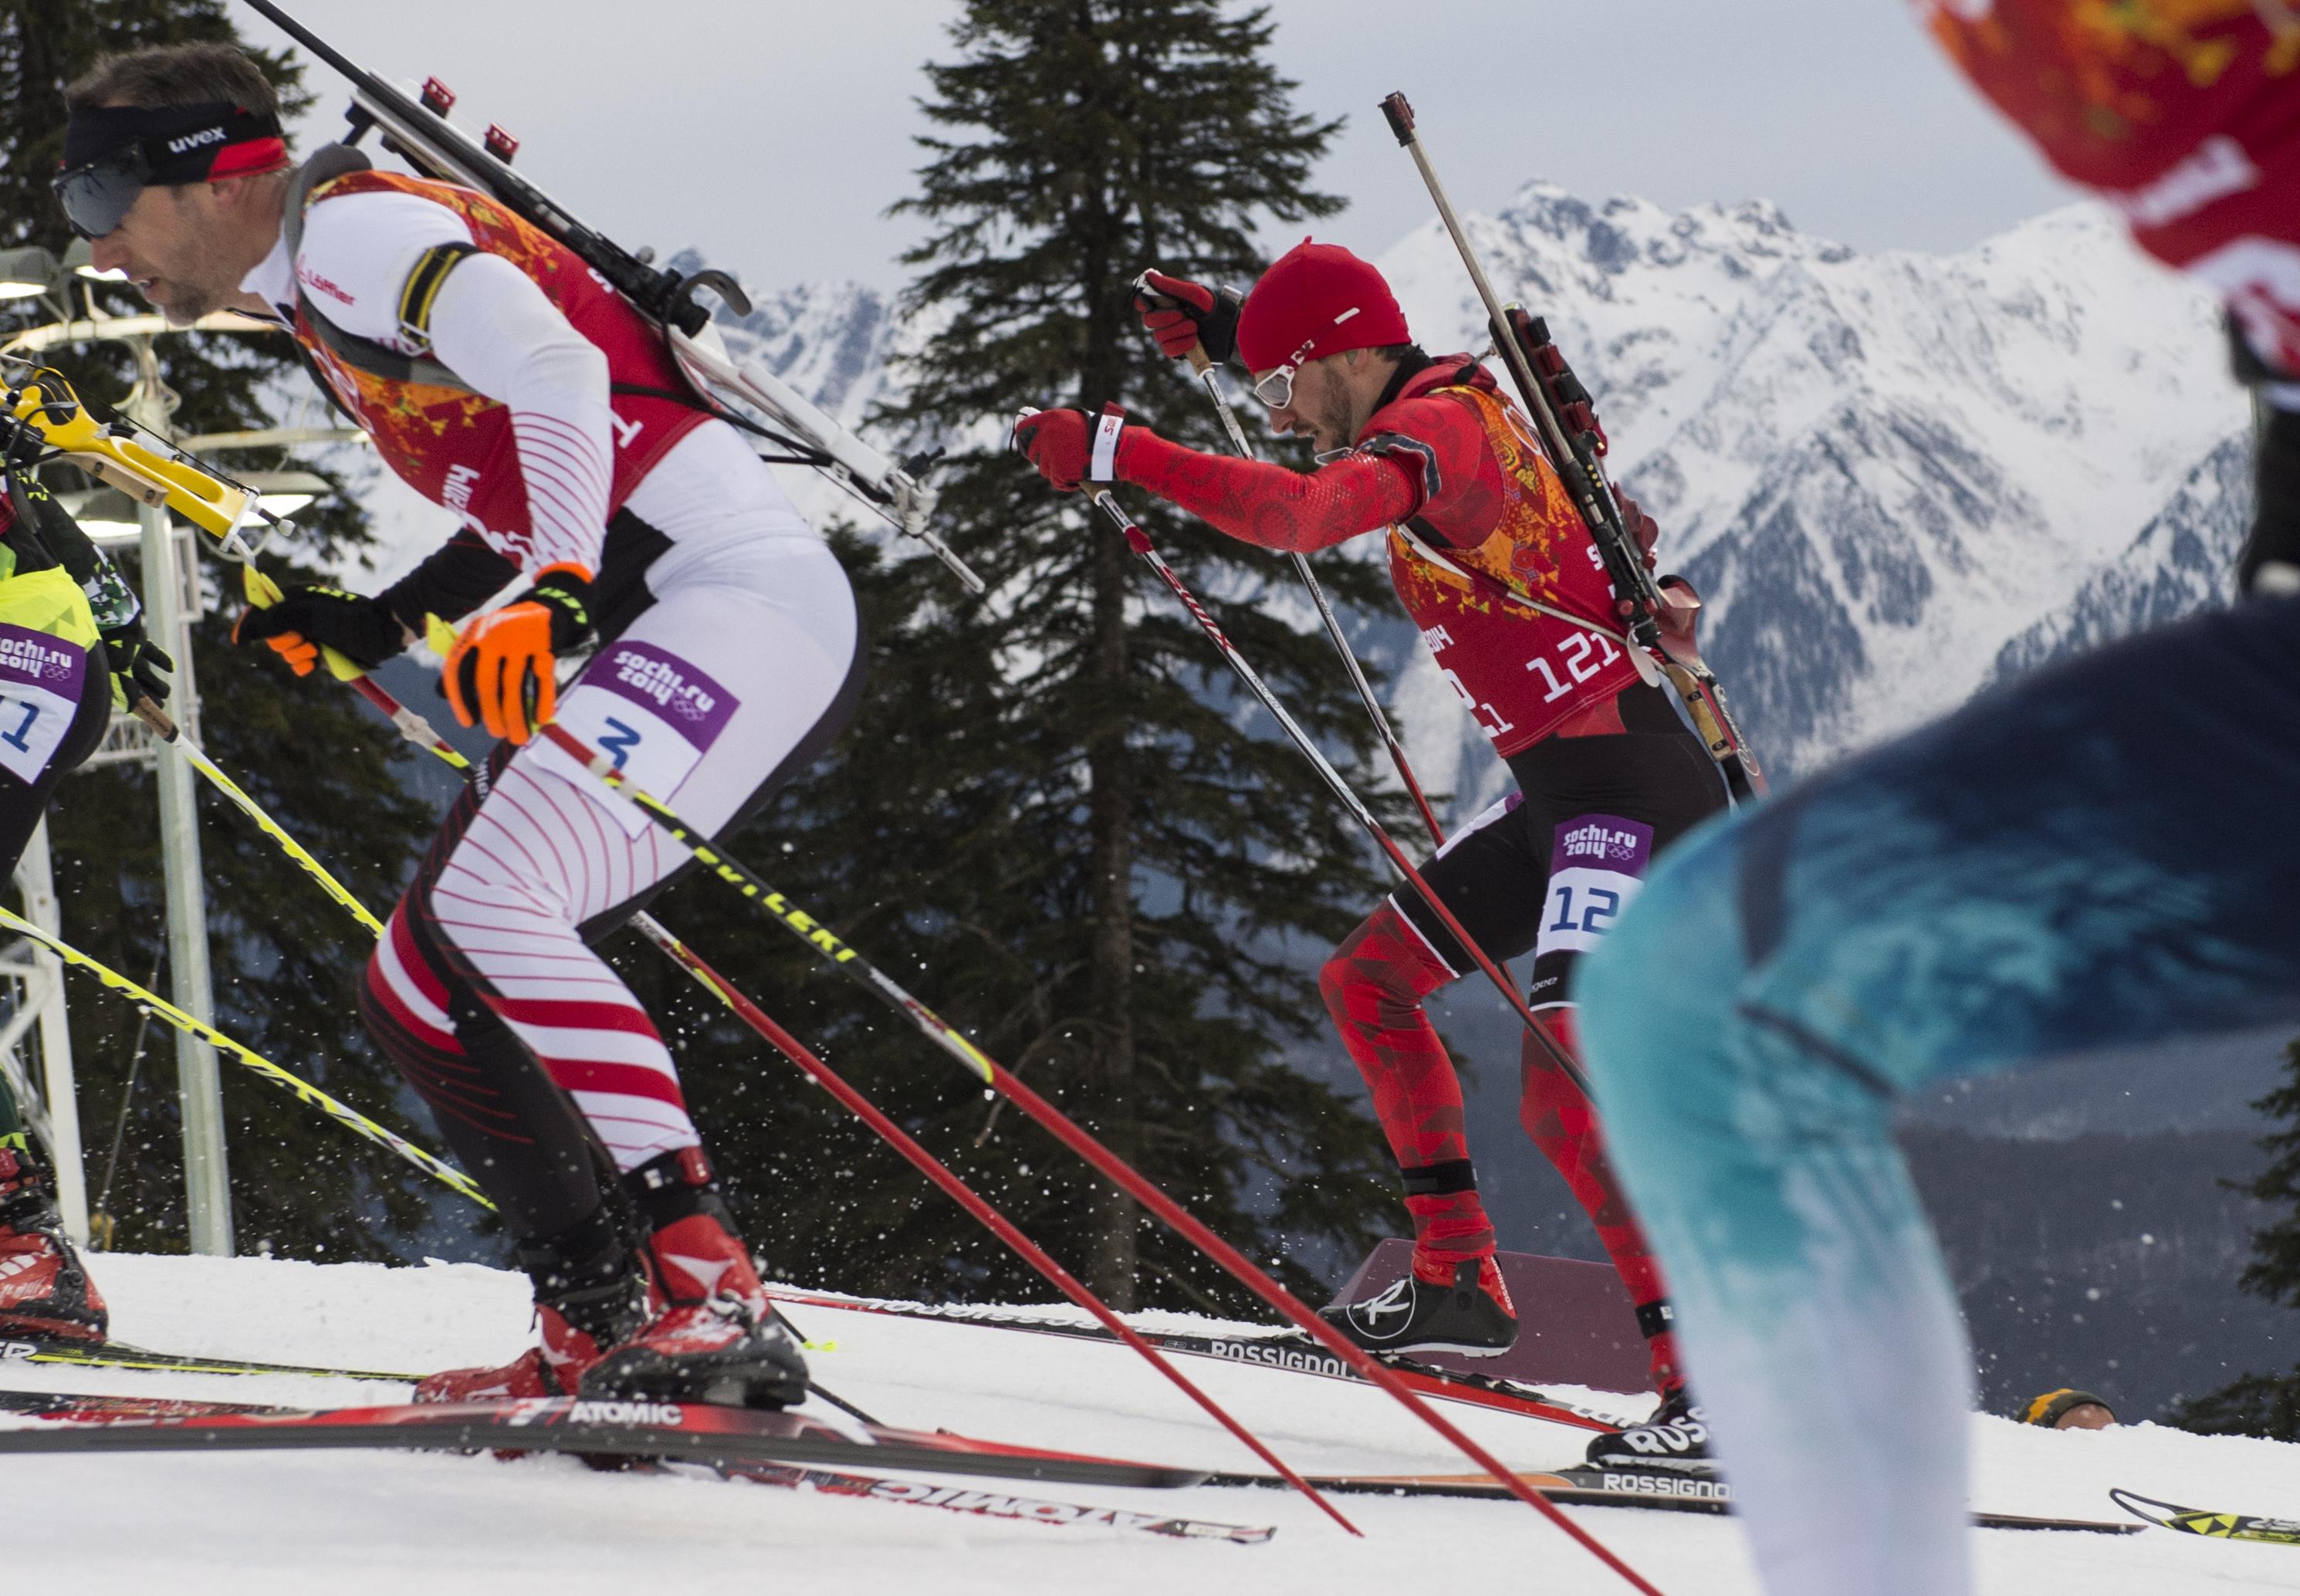 Biathlon 4x7.5km Relay